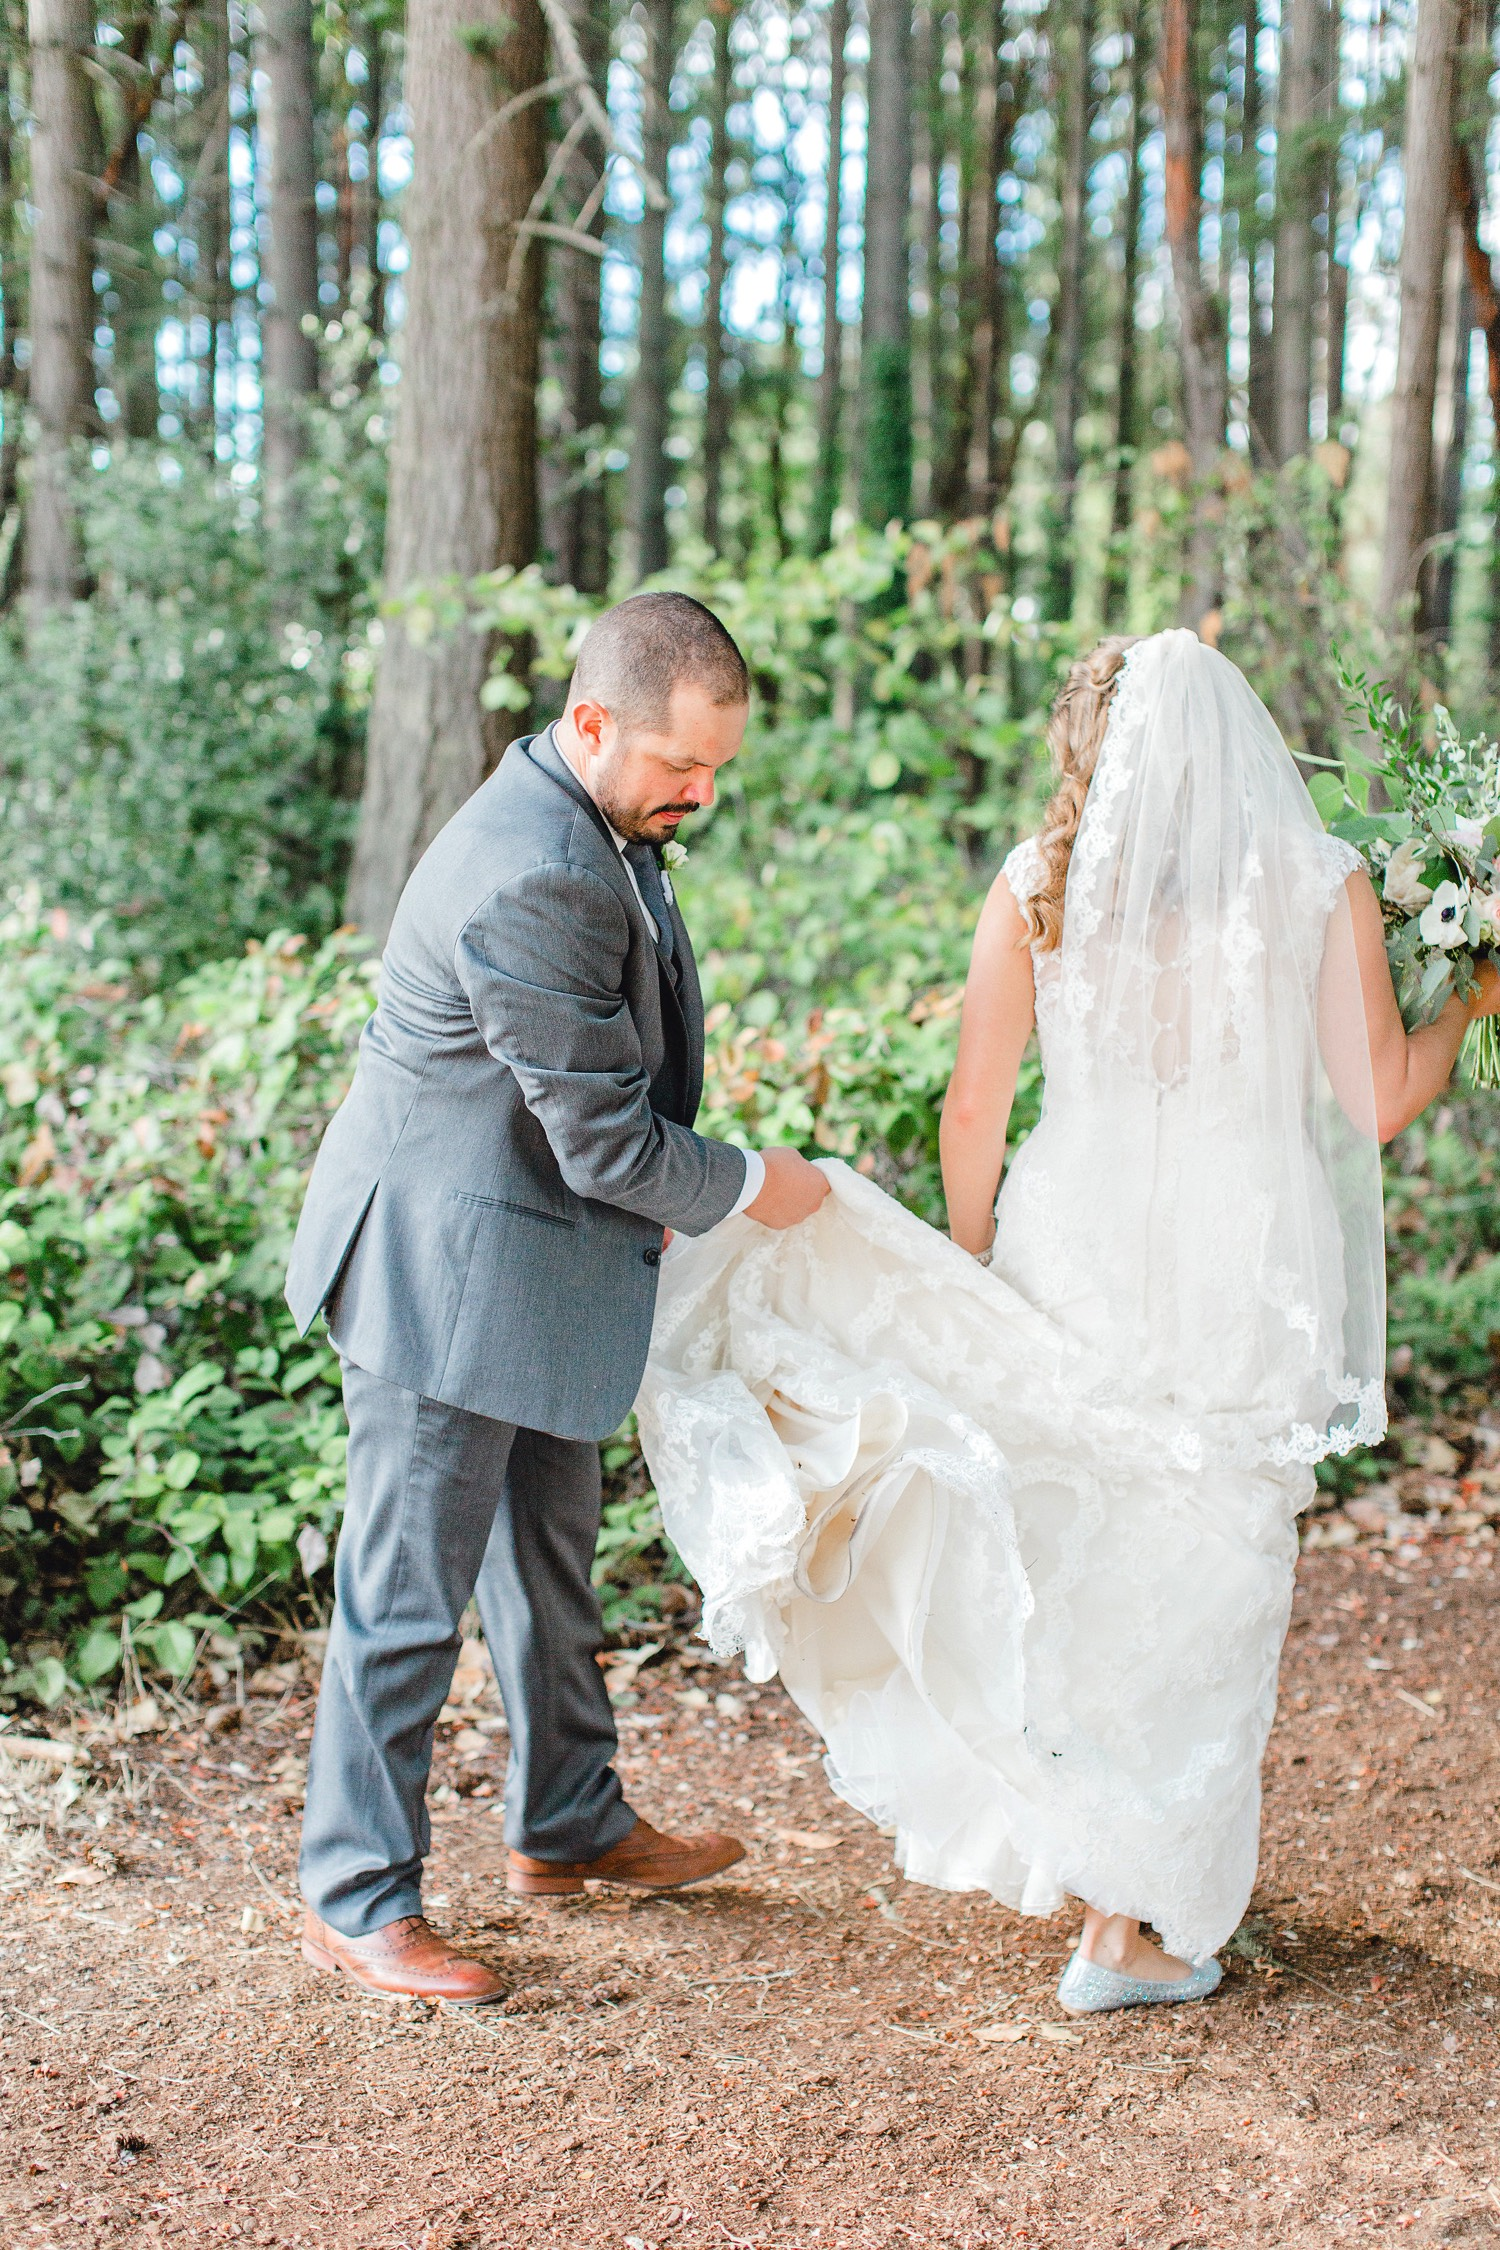 0000000000069_emmarosecompany_katiematt-9866_Photographer_PNW_House_Robinswood_Emma_Light_Company_Airy_Rose_and_Wedding_Seattle.jpg